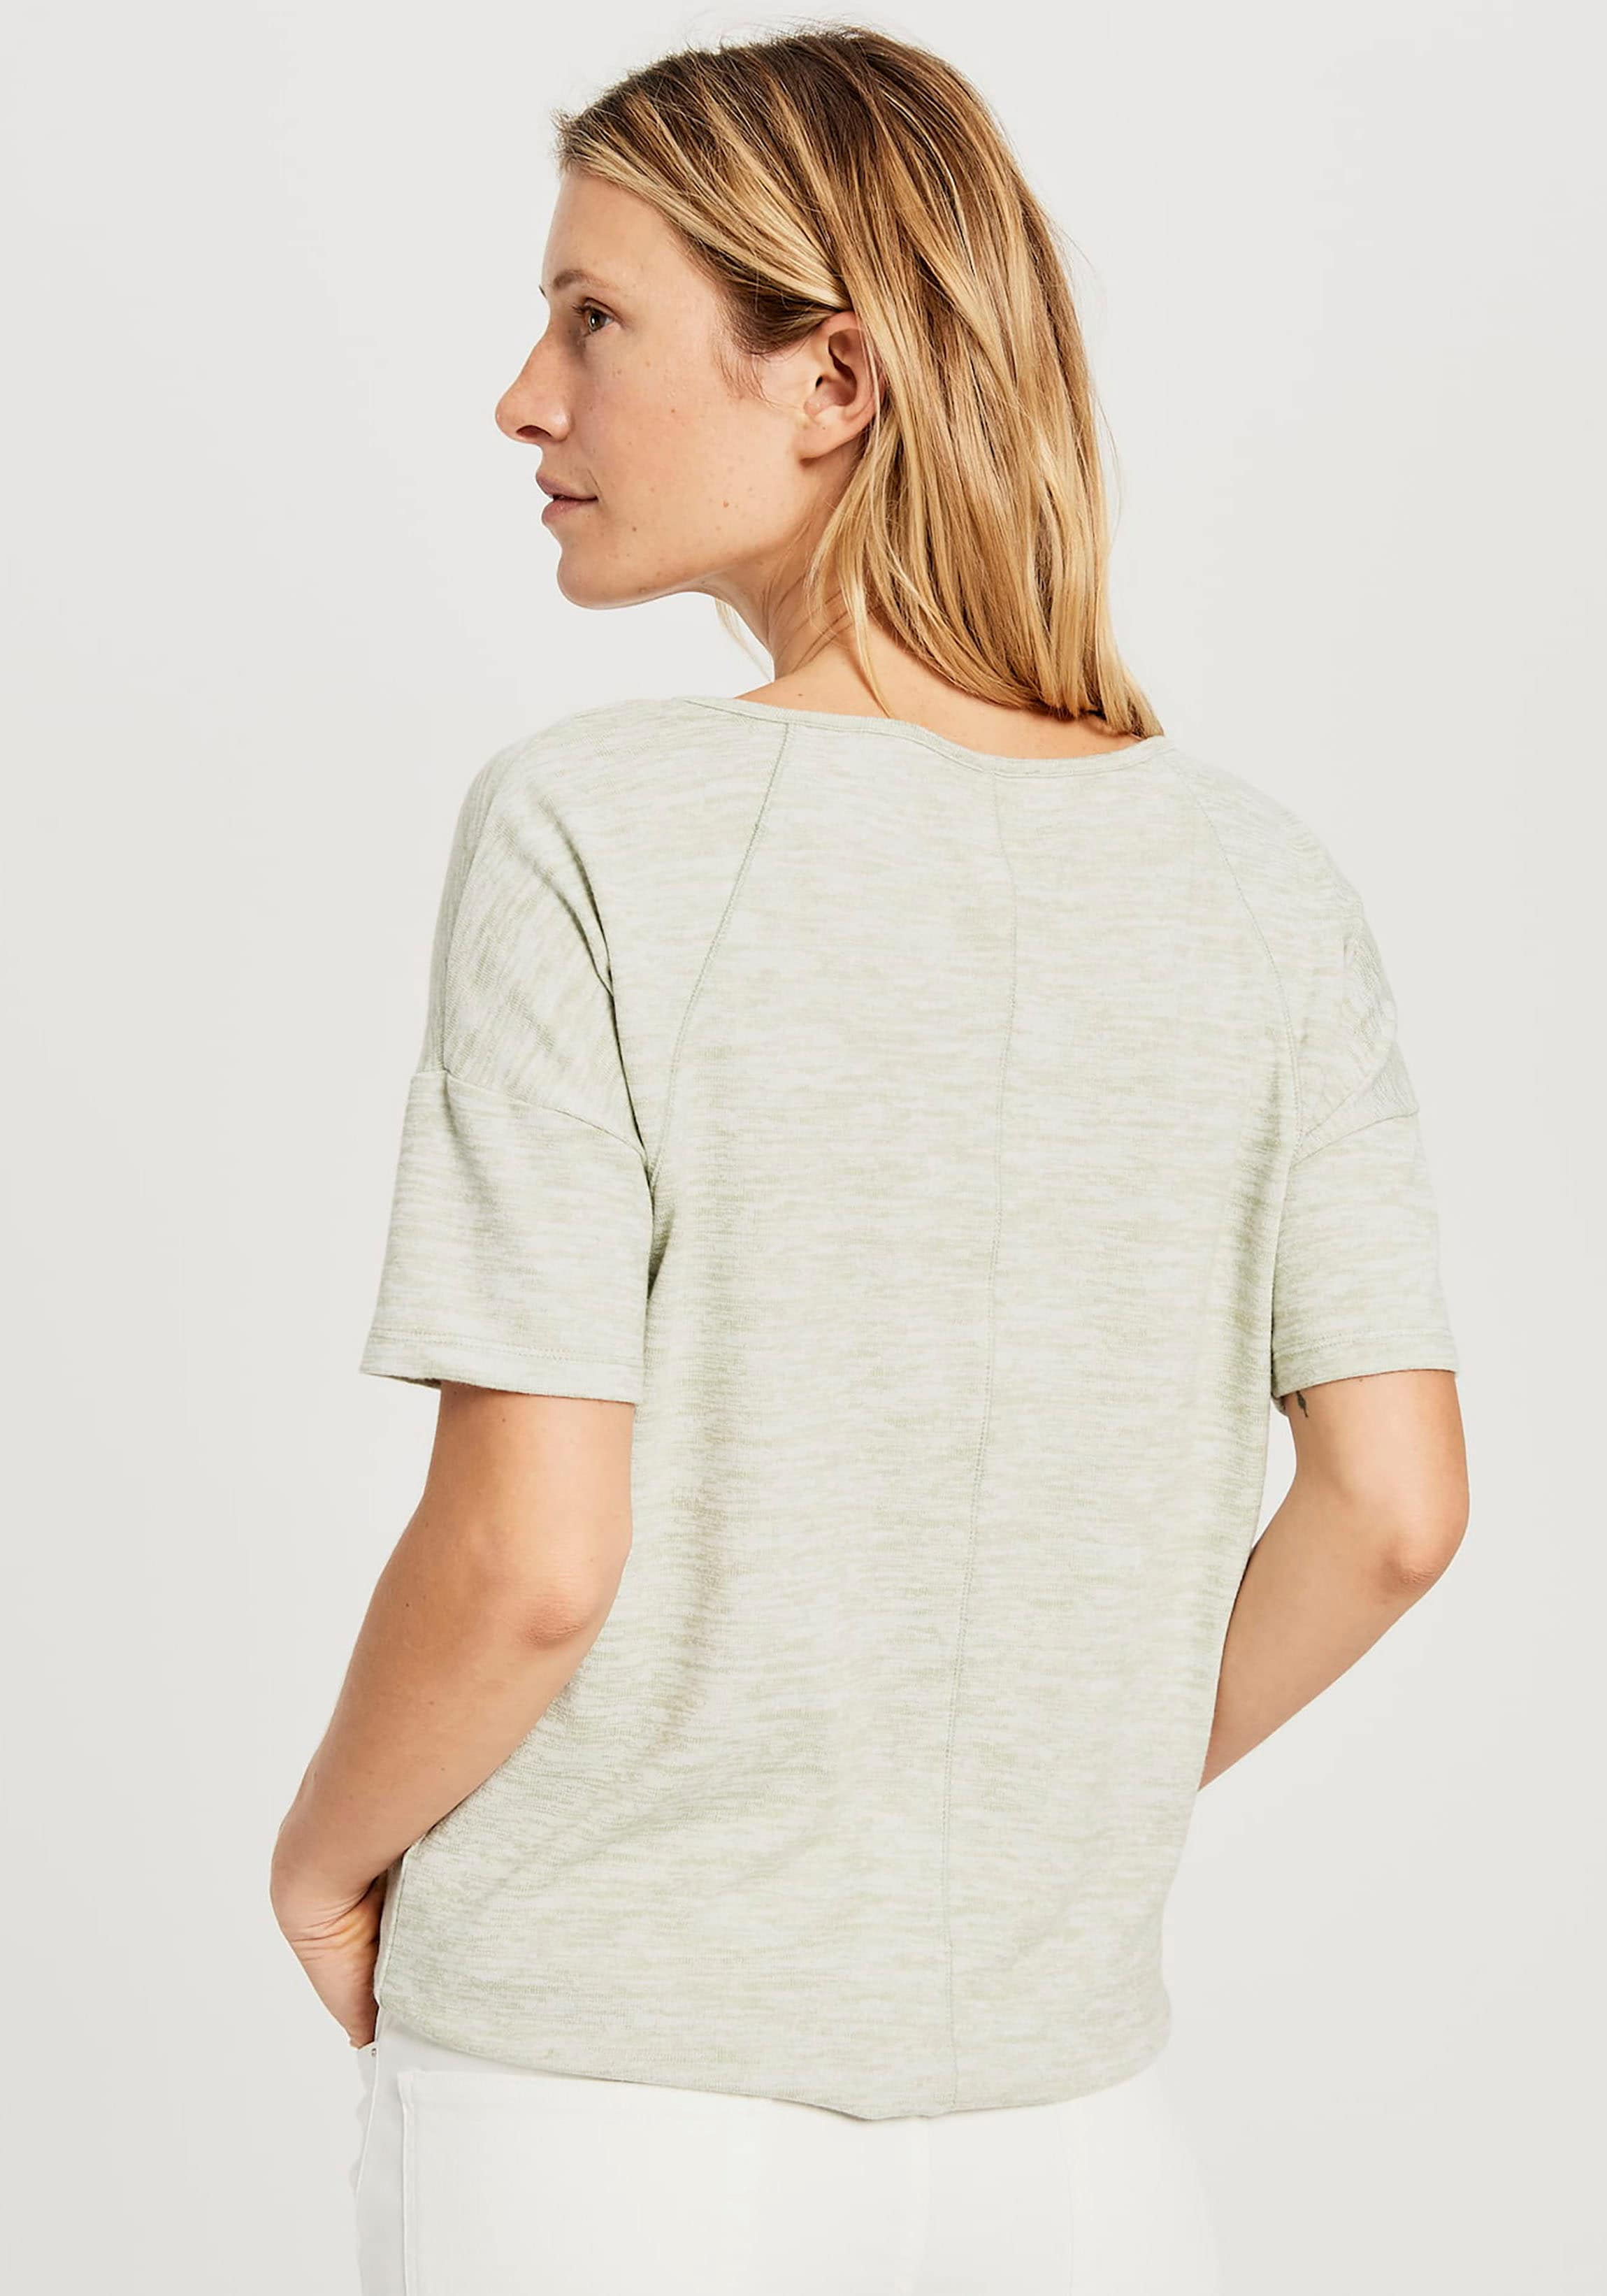 opus -  T-Shirt Sofiena, in lässiger Melange-Optik